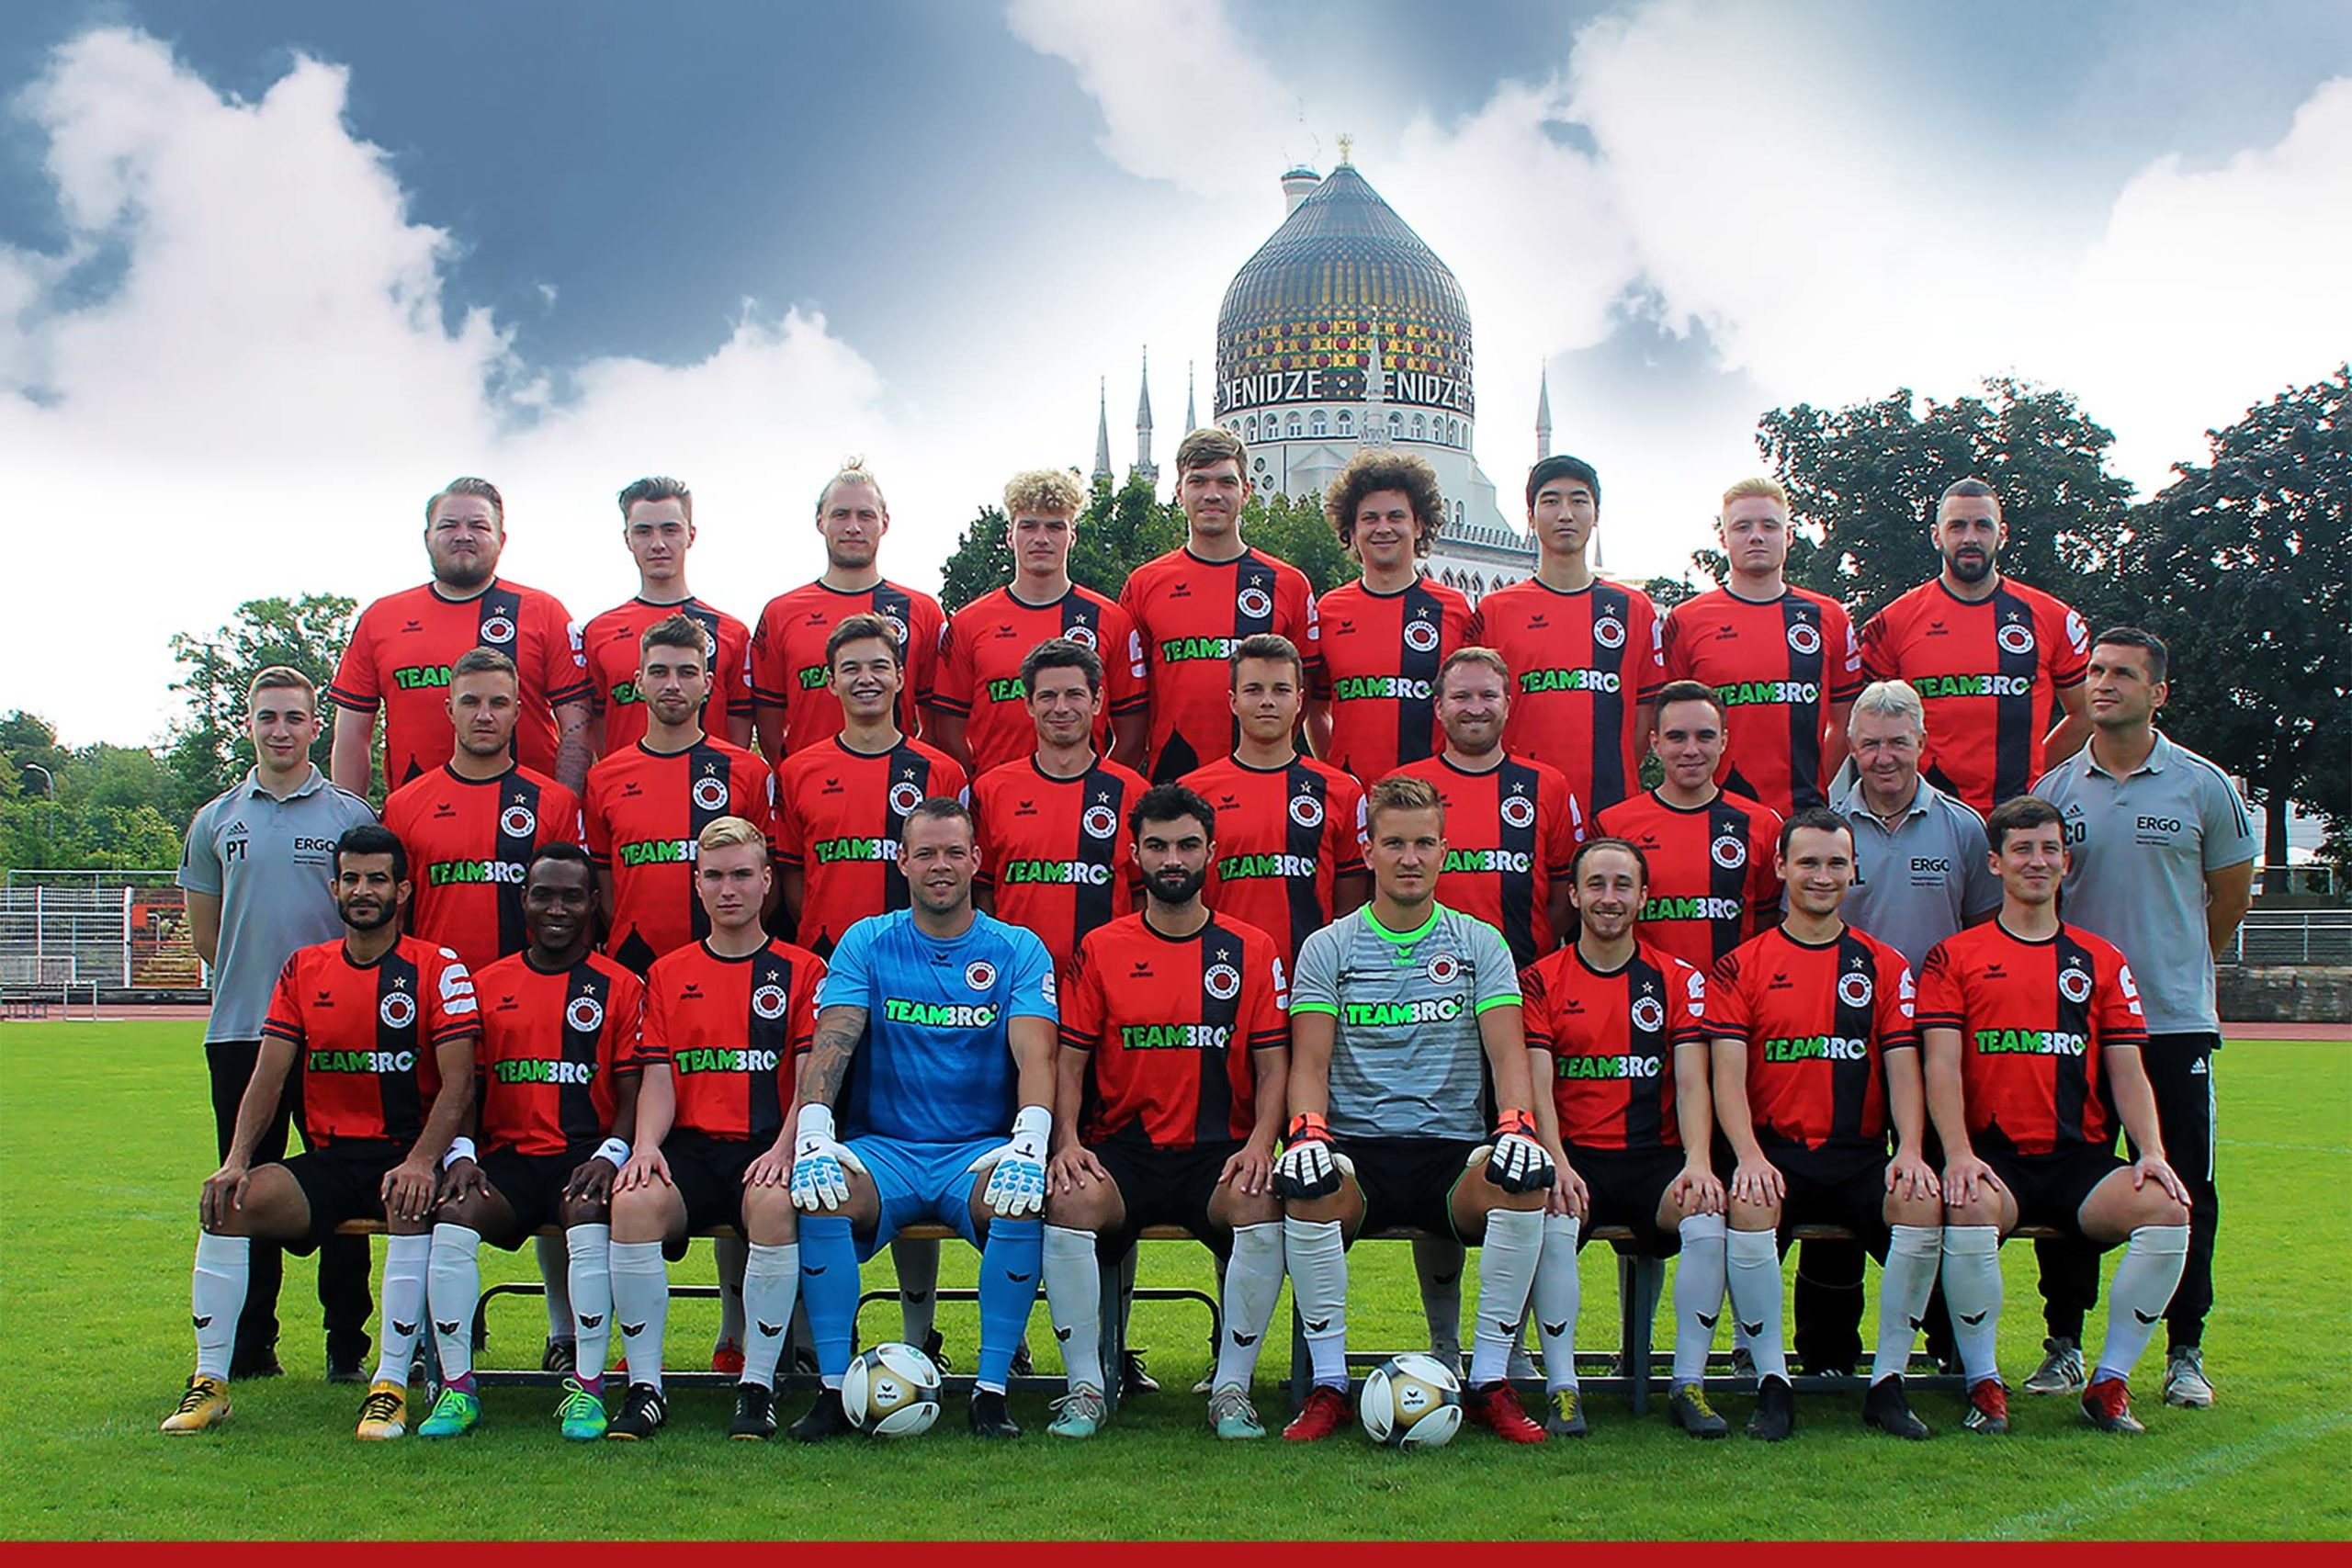 Mannschaftsfoto Dresdner SC 1898 Saison 2021/22